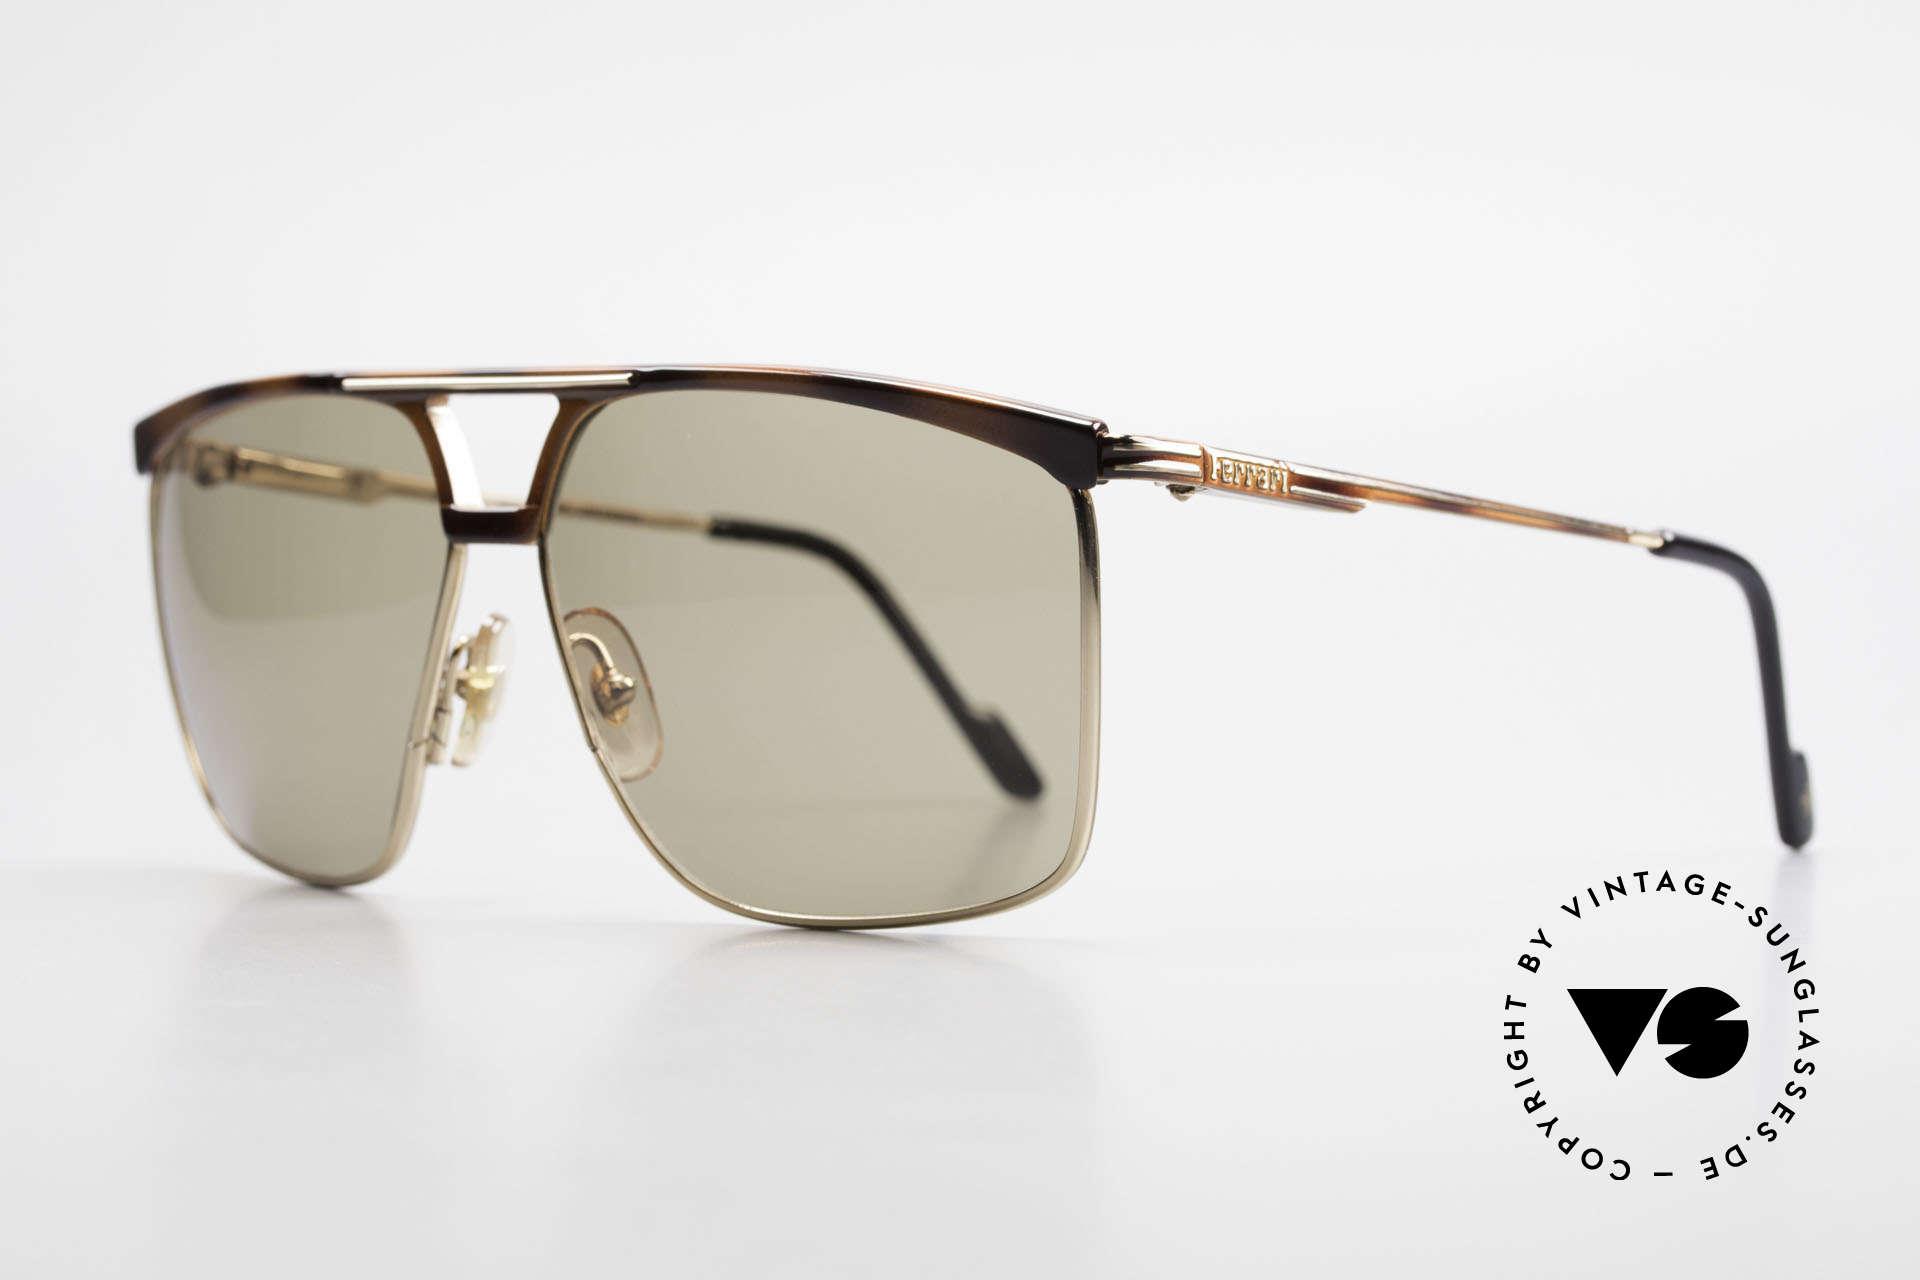 Ferrari F35 X-Large Sunglasses Alutanium, high-end Alutanium frame with flexible spring hinges, Made for Men